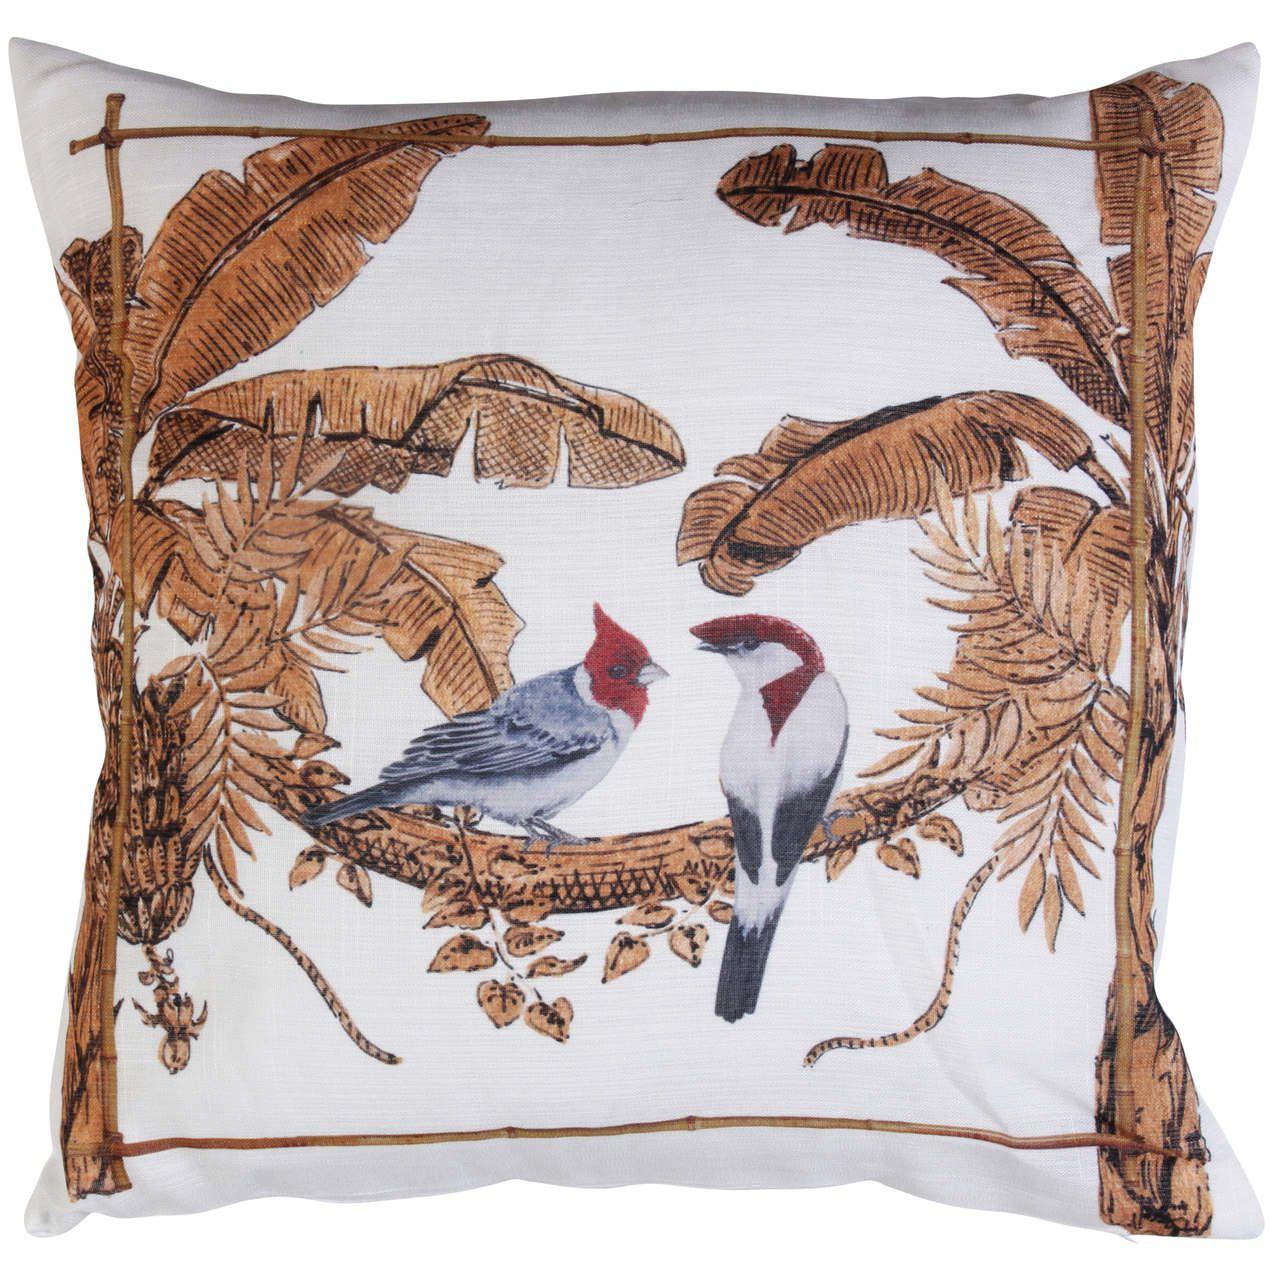 Almofada Golden Forest Casal Pássaros Cód.: 3607 - MB